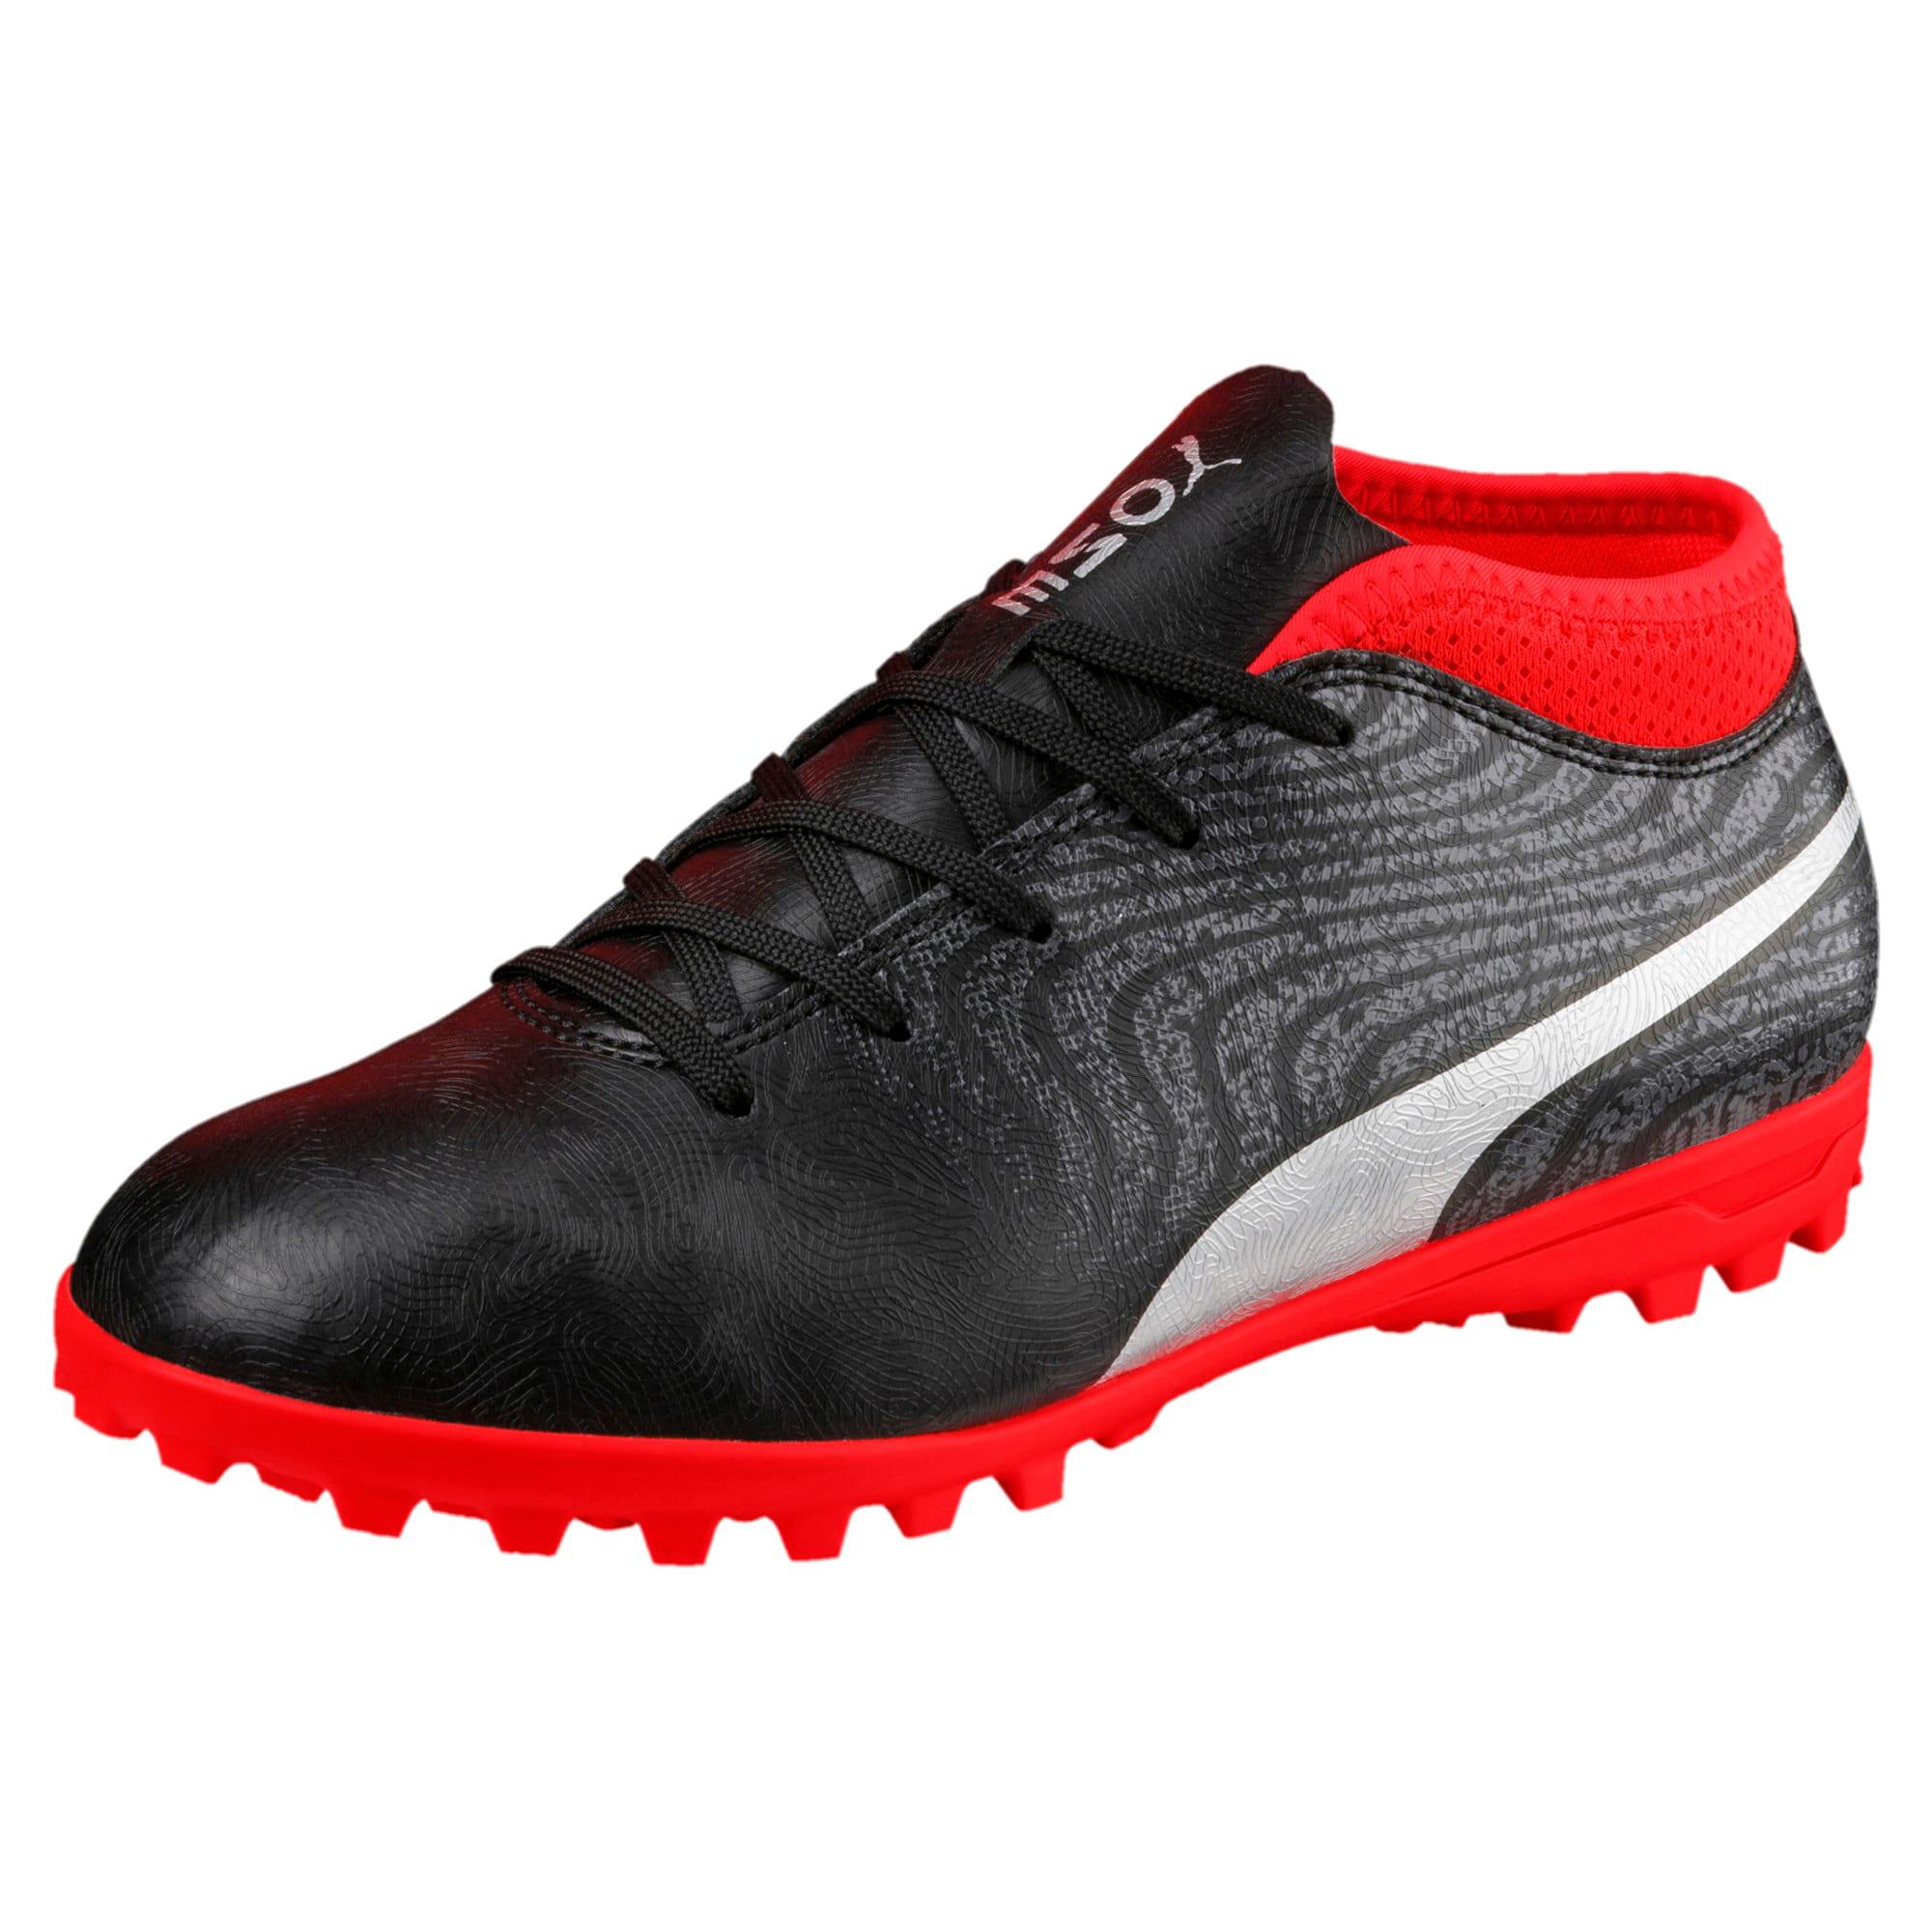 Thumbnail 1 of ONE 18.4 TT Jr Football Boots, Black-Silver-Red, medium-IND